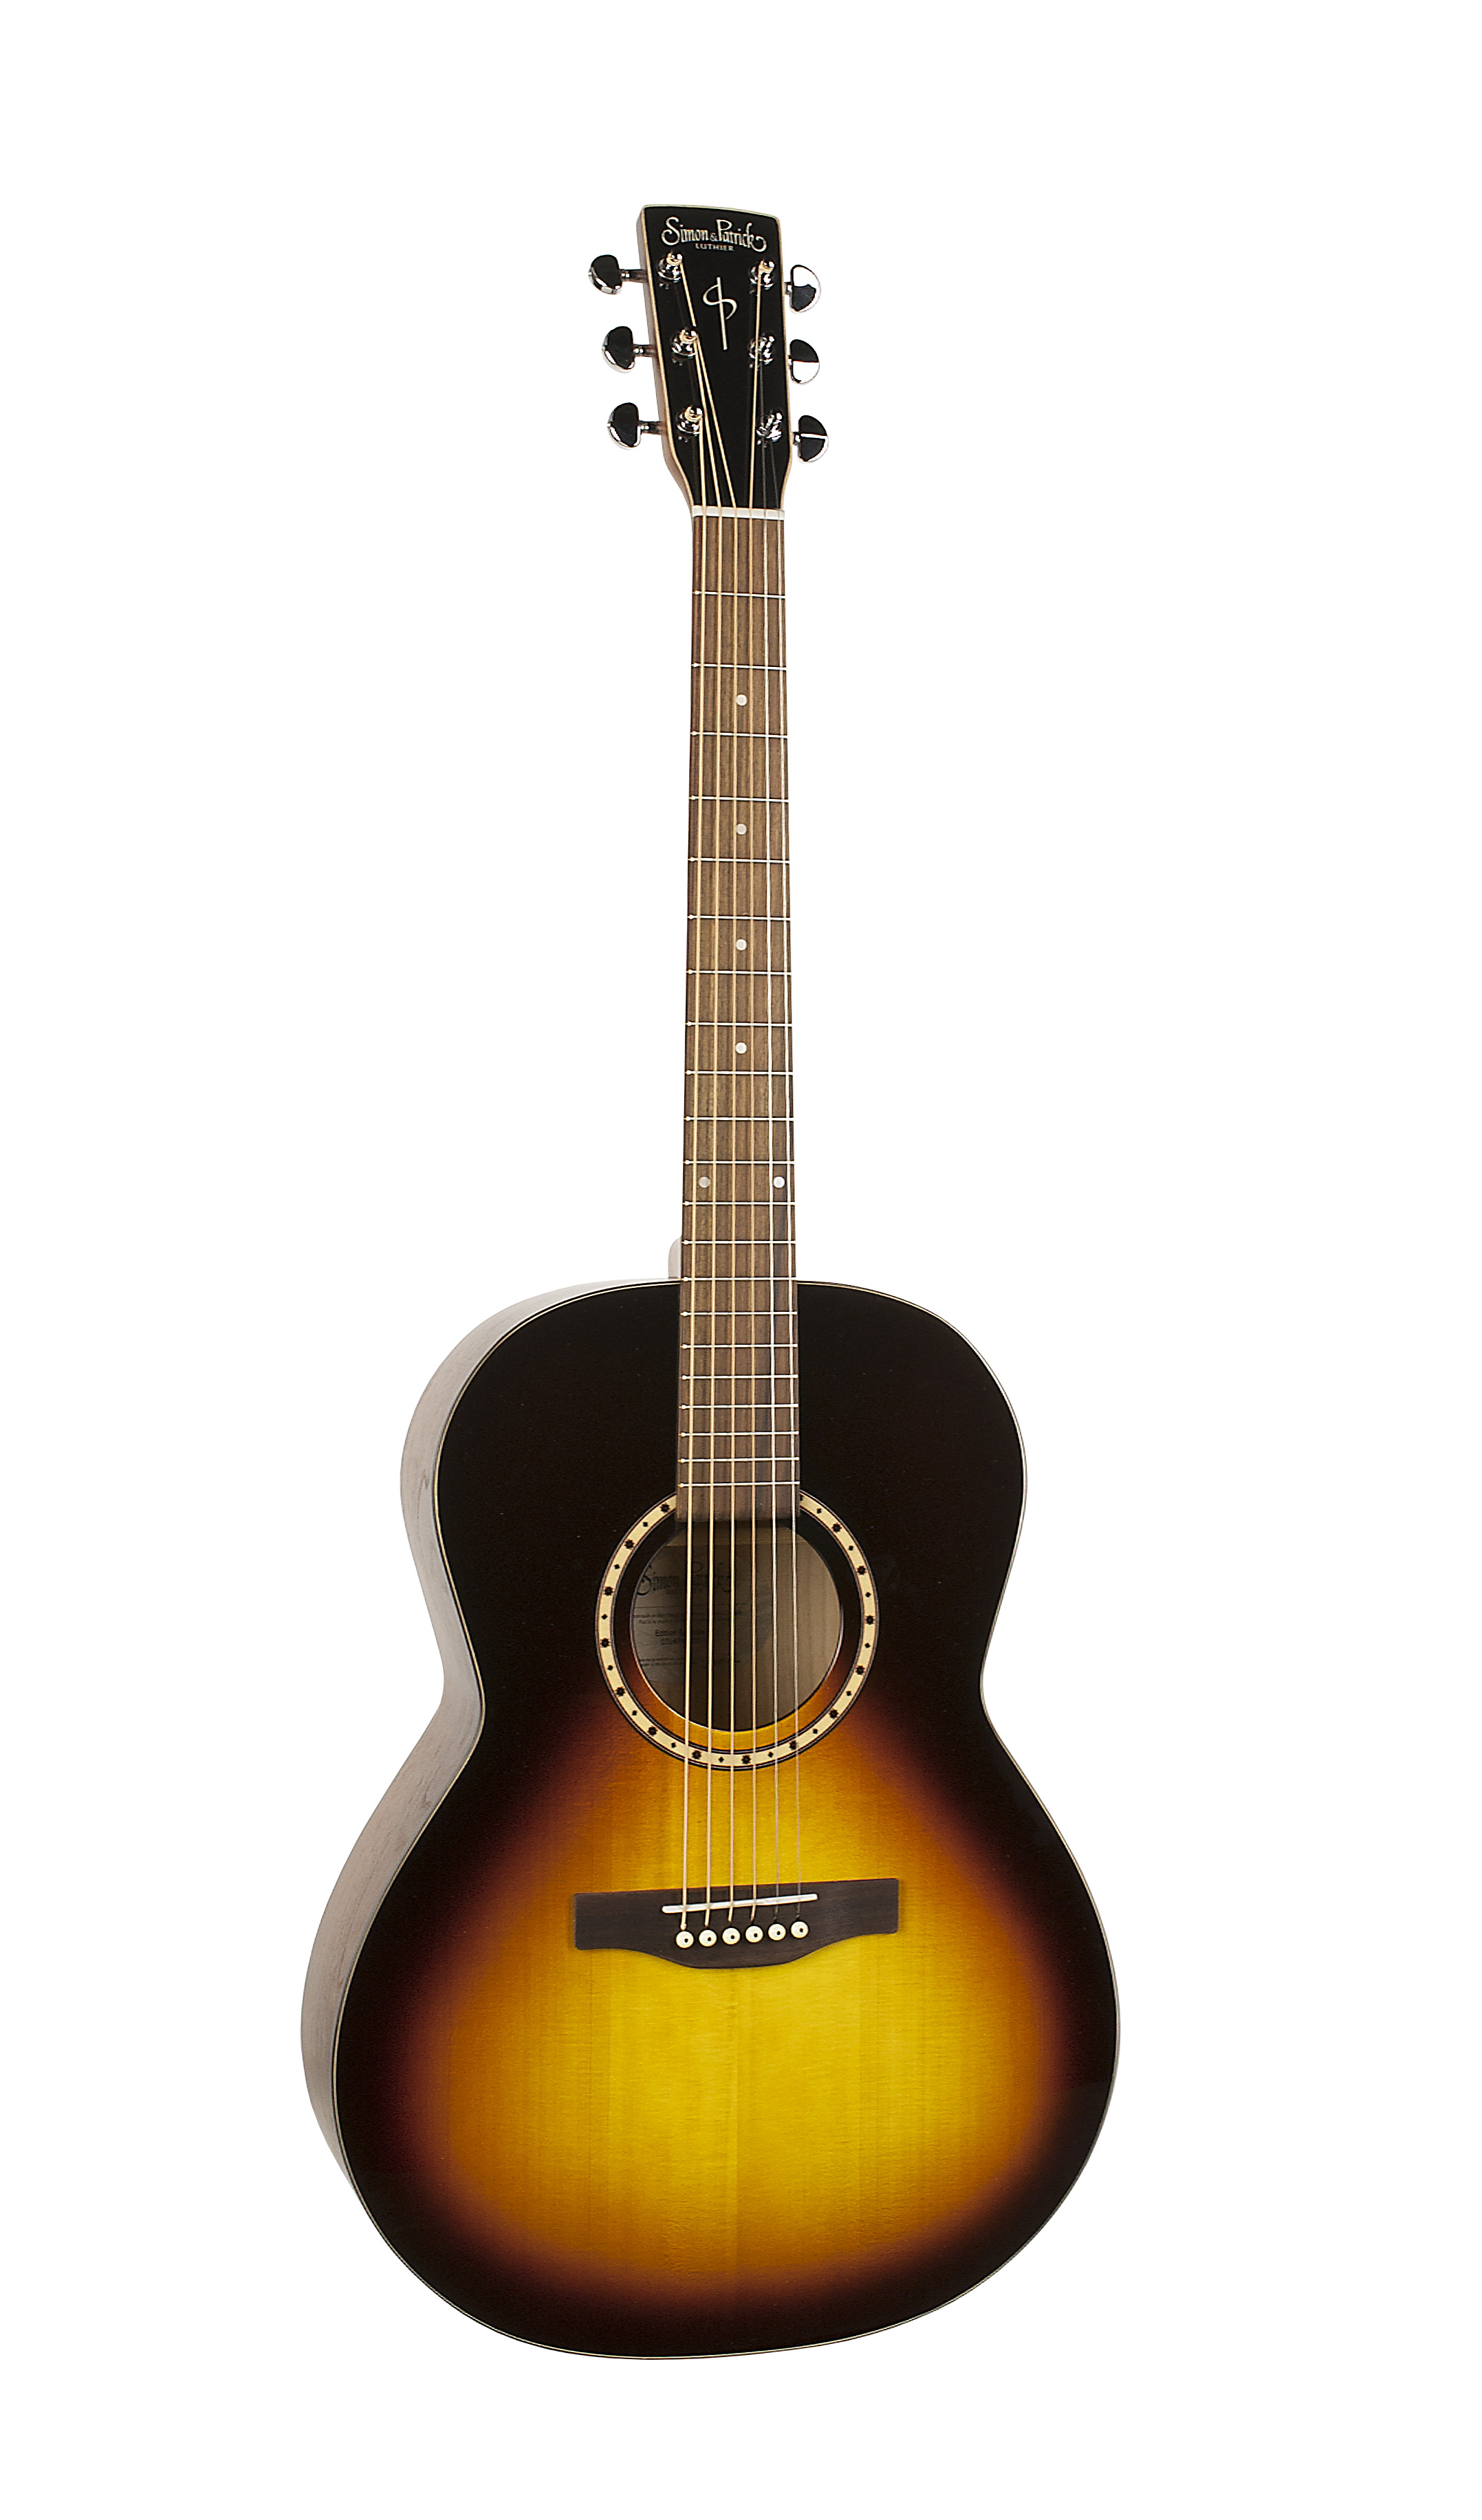 Simon & Patrick 40261 Songsmith Gloss Top Sunburst Folk Acoustic Guitar